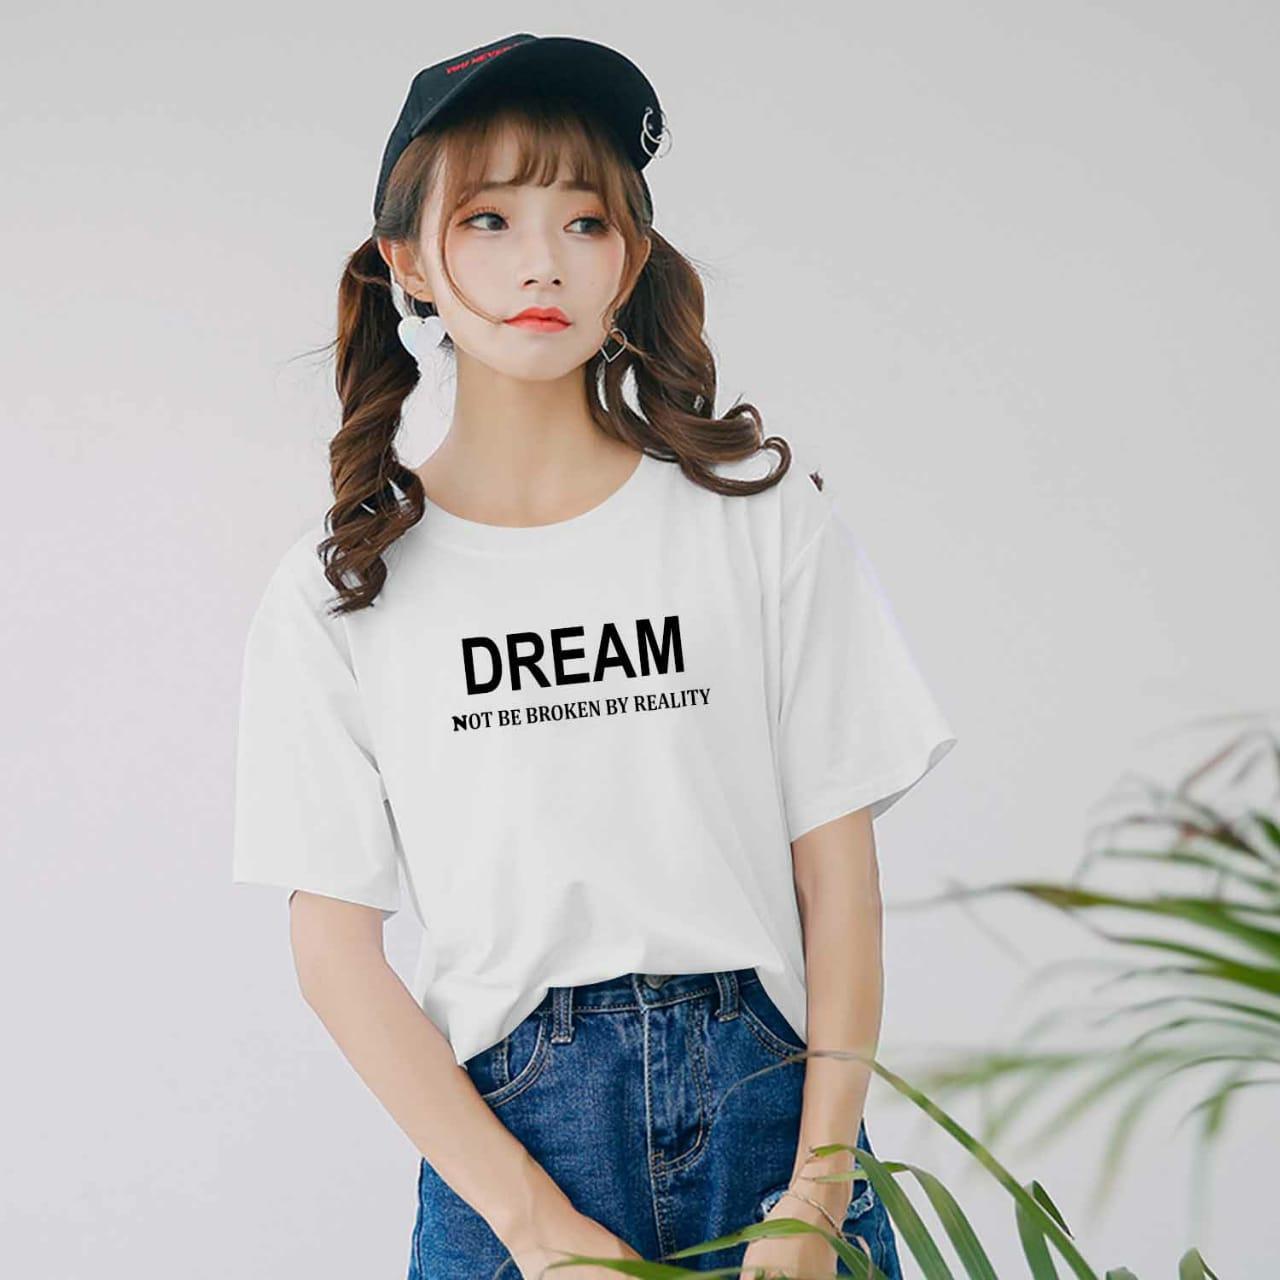 XV Kaos Wanita tee DREAM   T-shirt Distro Wanita   Baju Atasan Kaos Cewek    Tumblr Tee Cewek   Kaos Wanita Murah   Baju Wanita Murah   Kaos Lengan  Pendek ... 6b343d7ef8